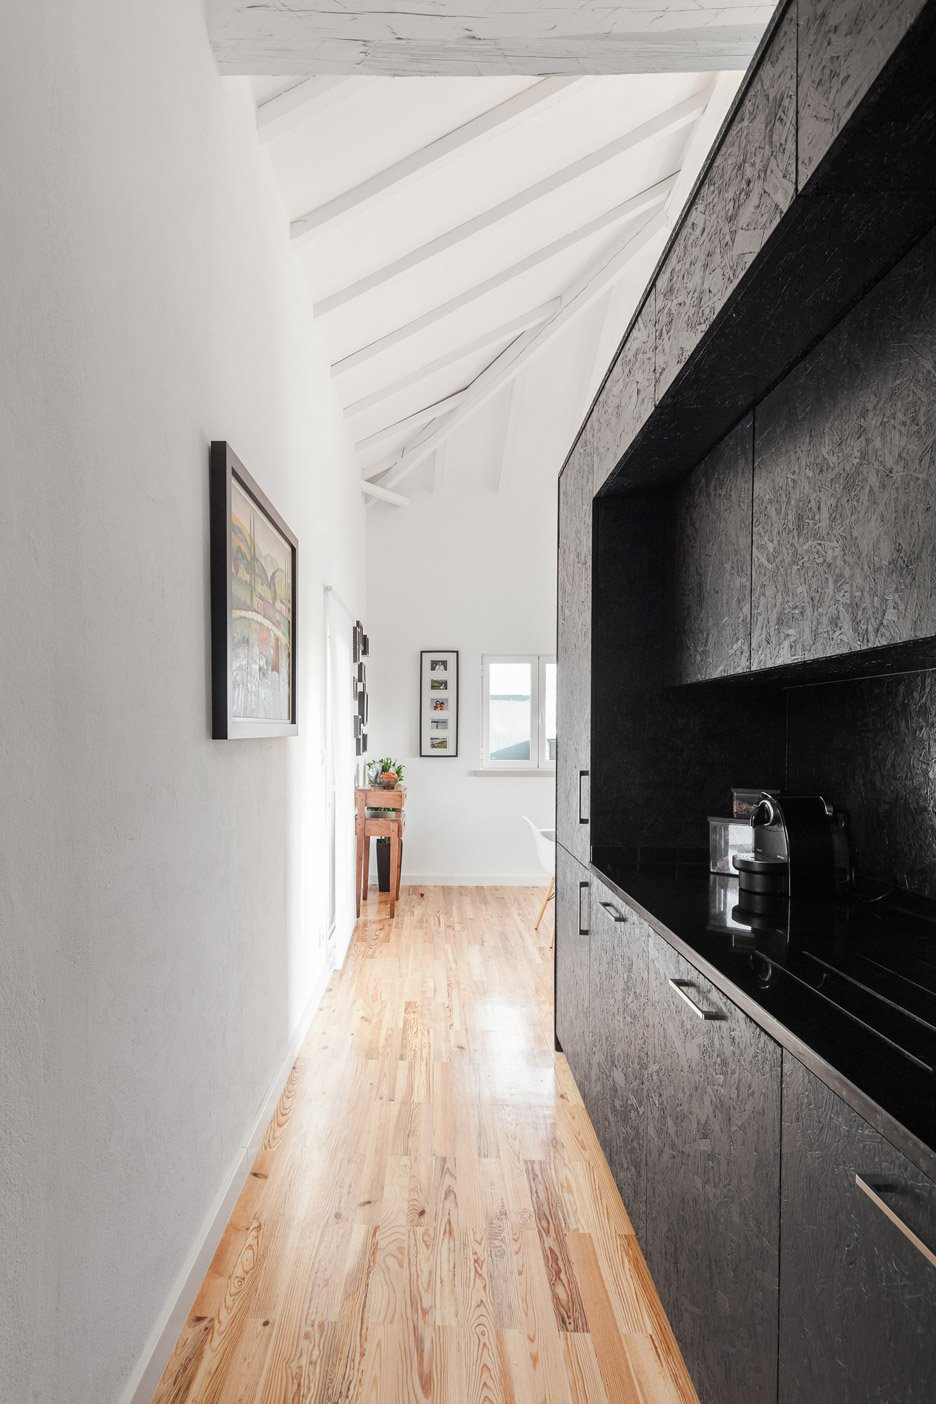 Barn-House_Monte-Real_Ines-Brandao_dezeen_936_3.jpg